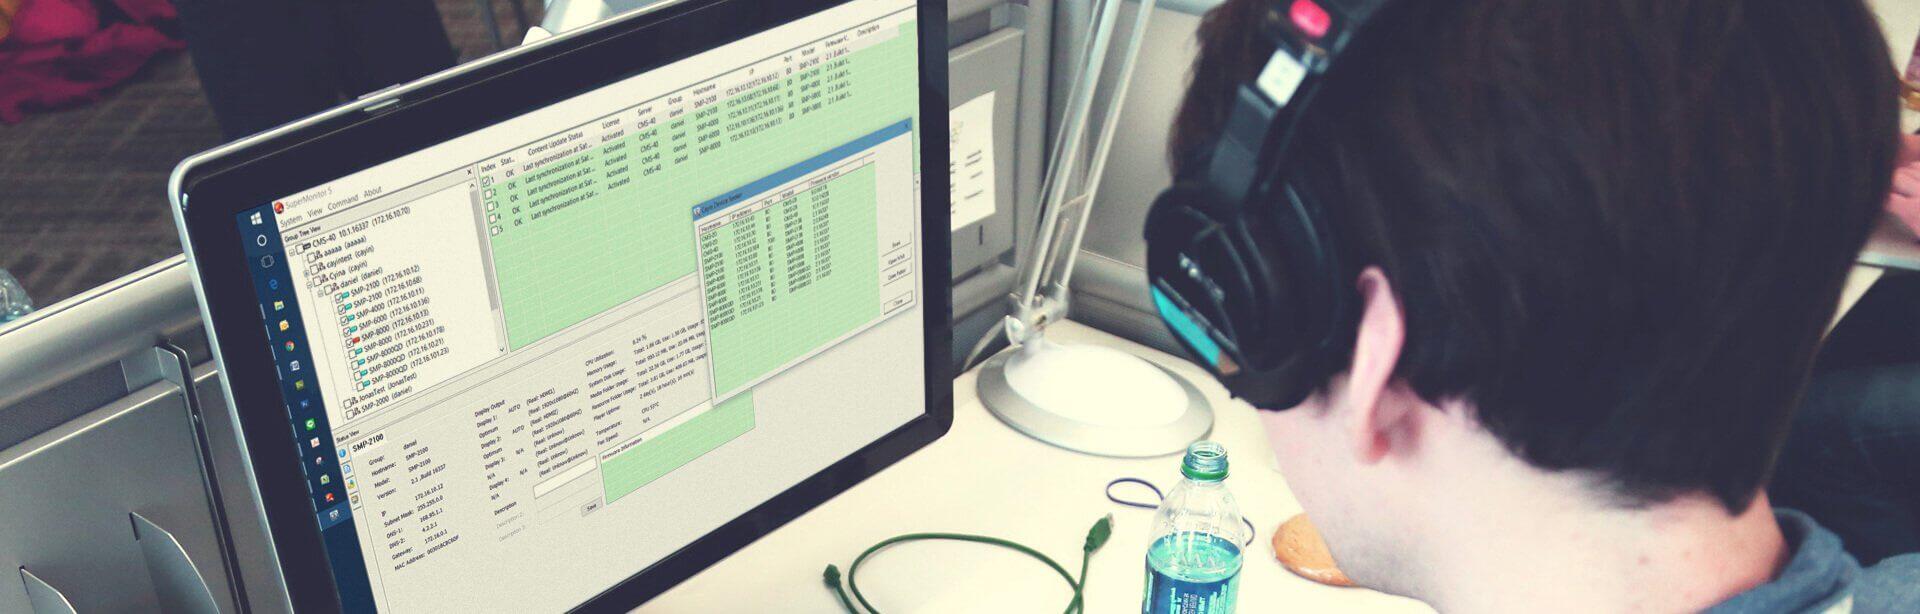 CAYIN Tech | SuperReporter2 Advanced Digital Signage Reporting